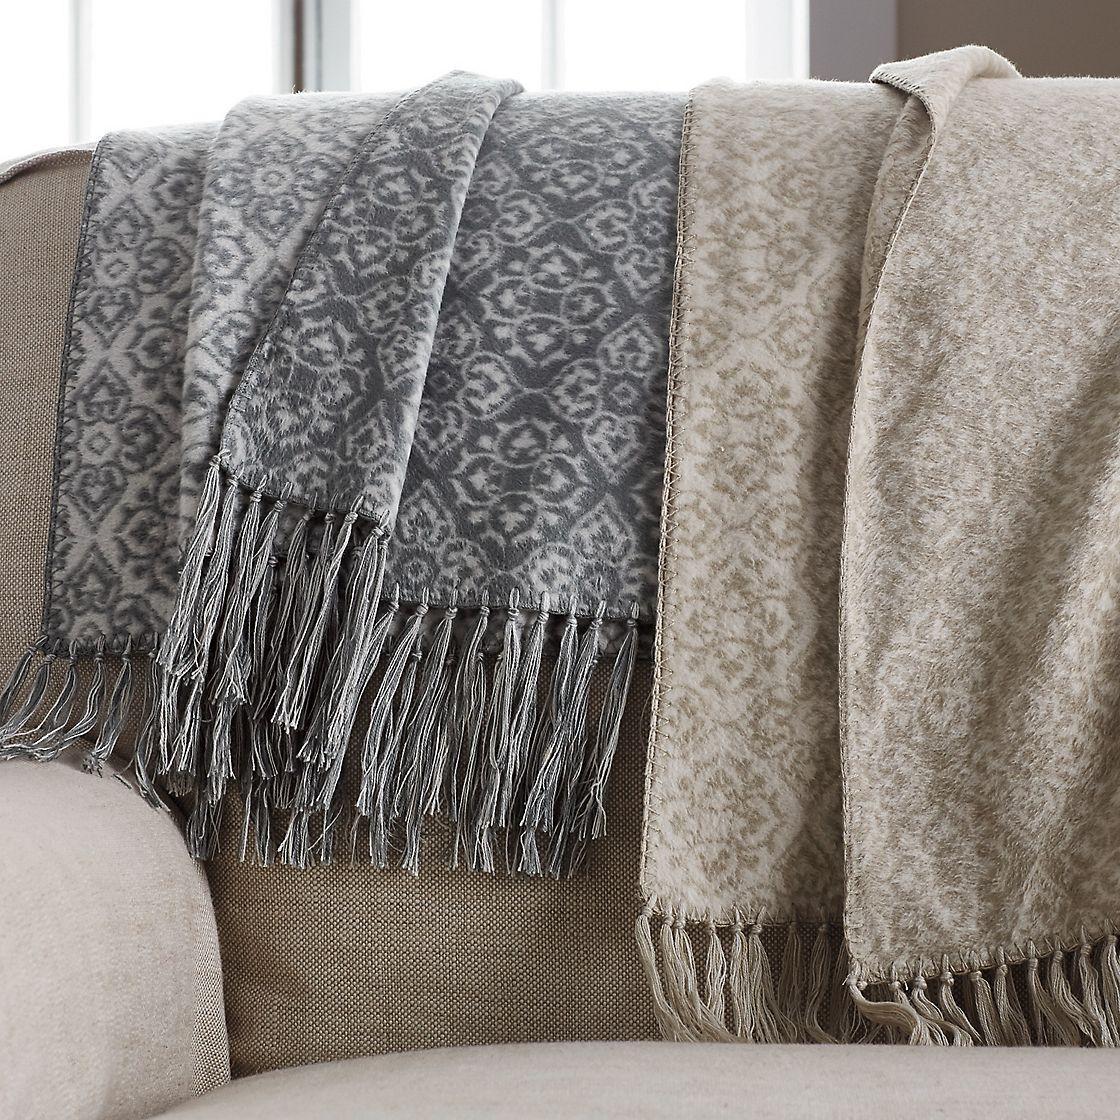 Silk Jacquard Throw Blanket Company Store